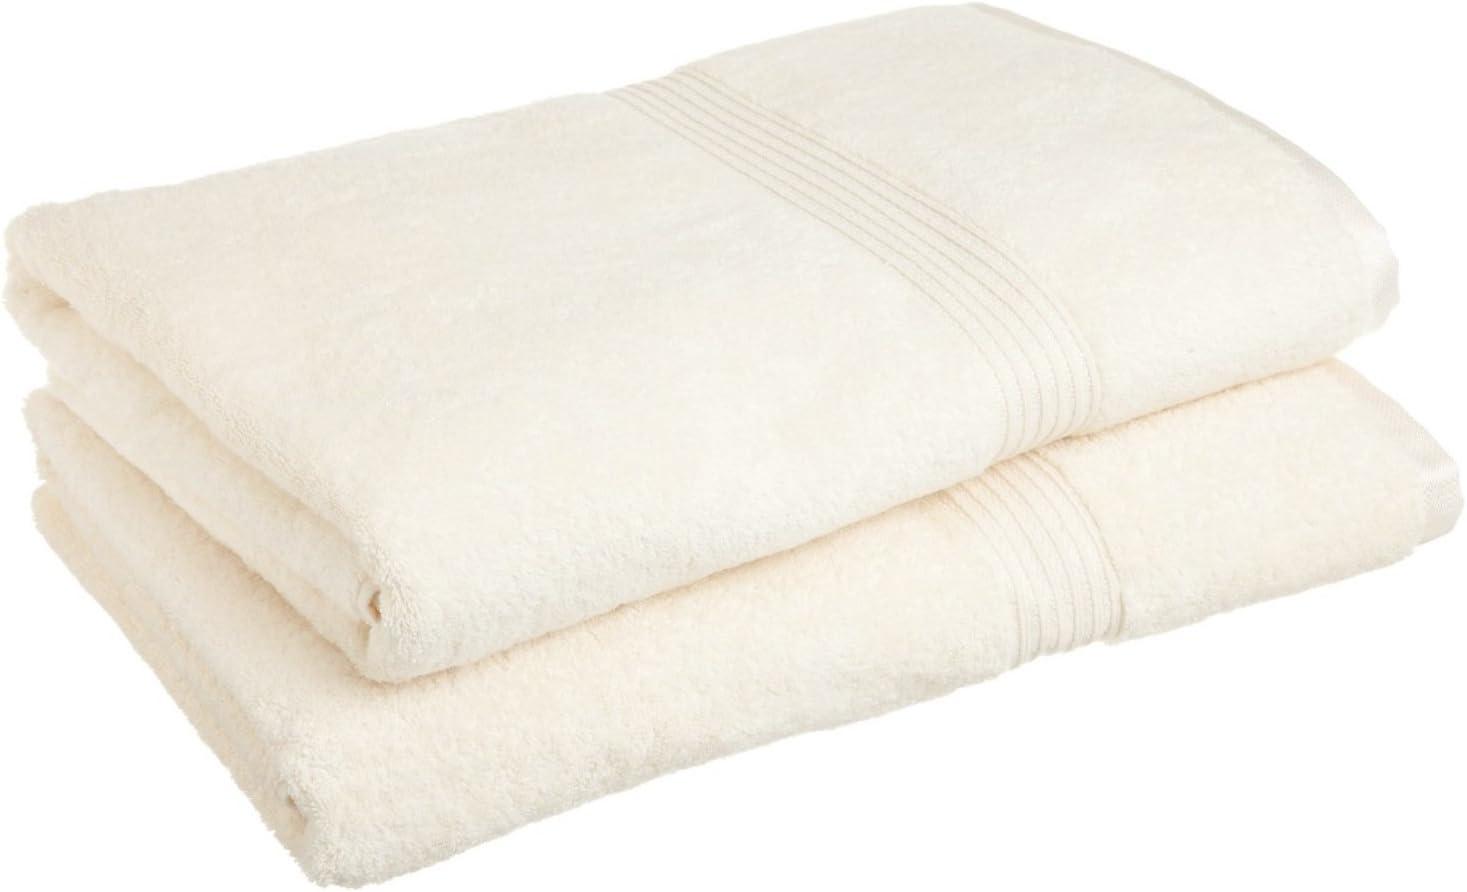 Marrikas Egyptian Cotton Bath Sheet Ivory 2 Pack